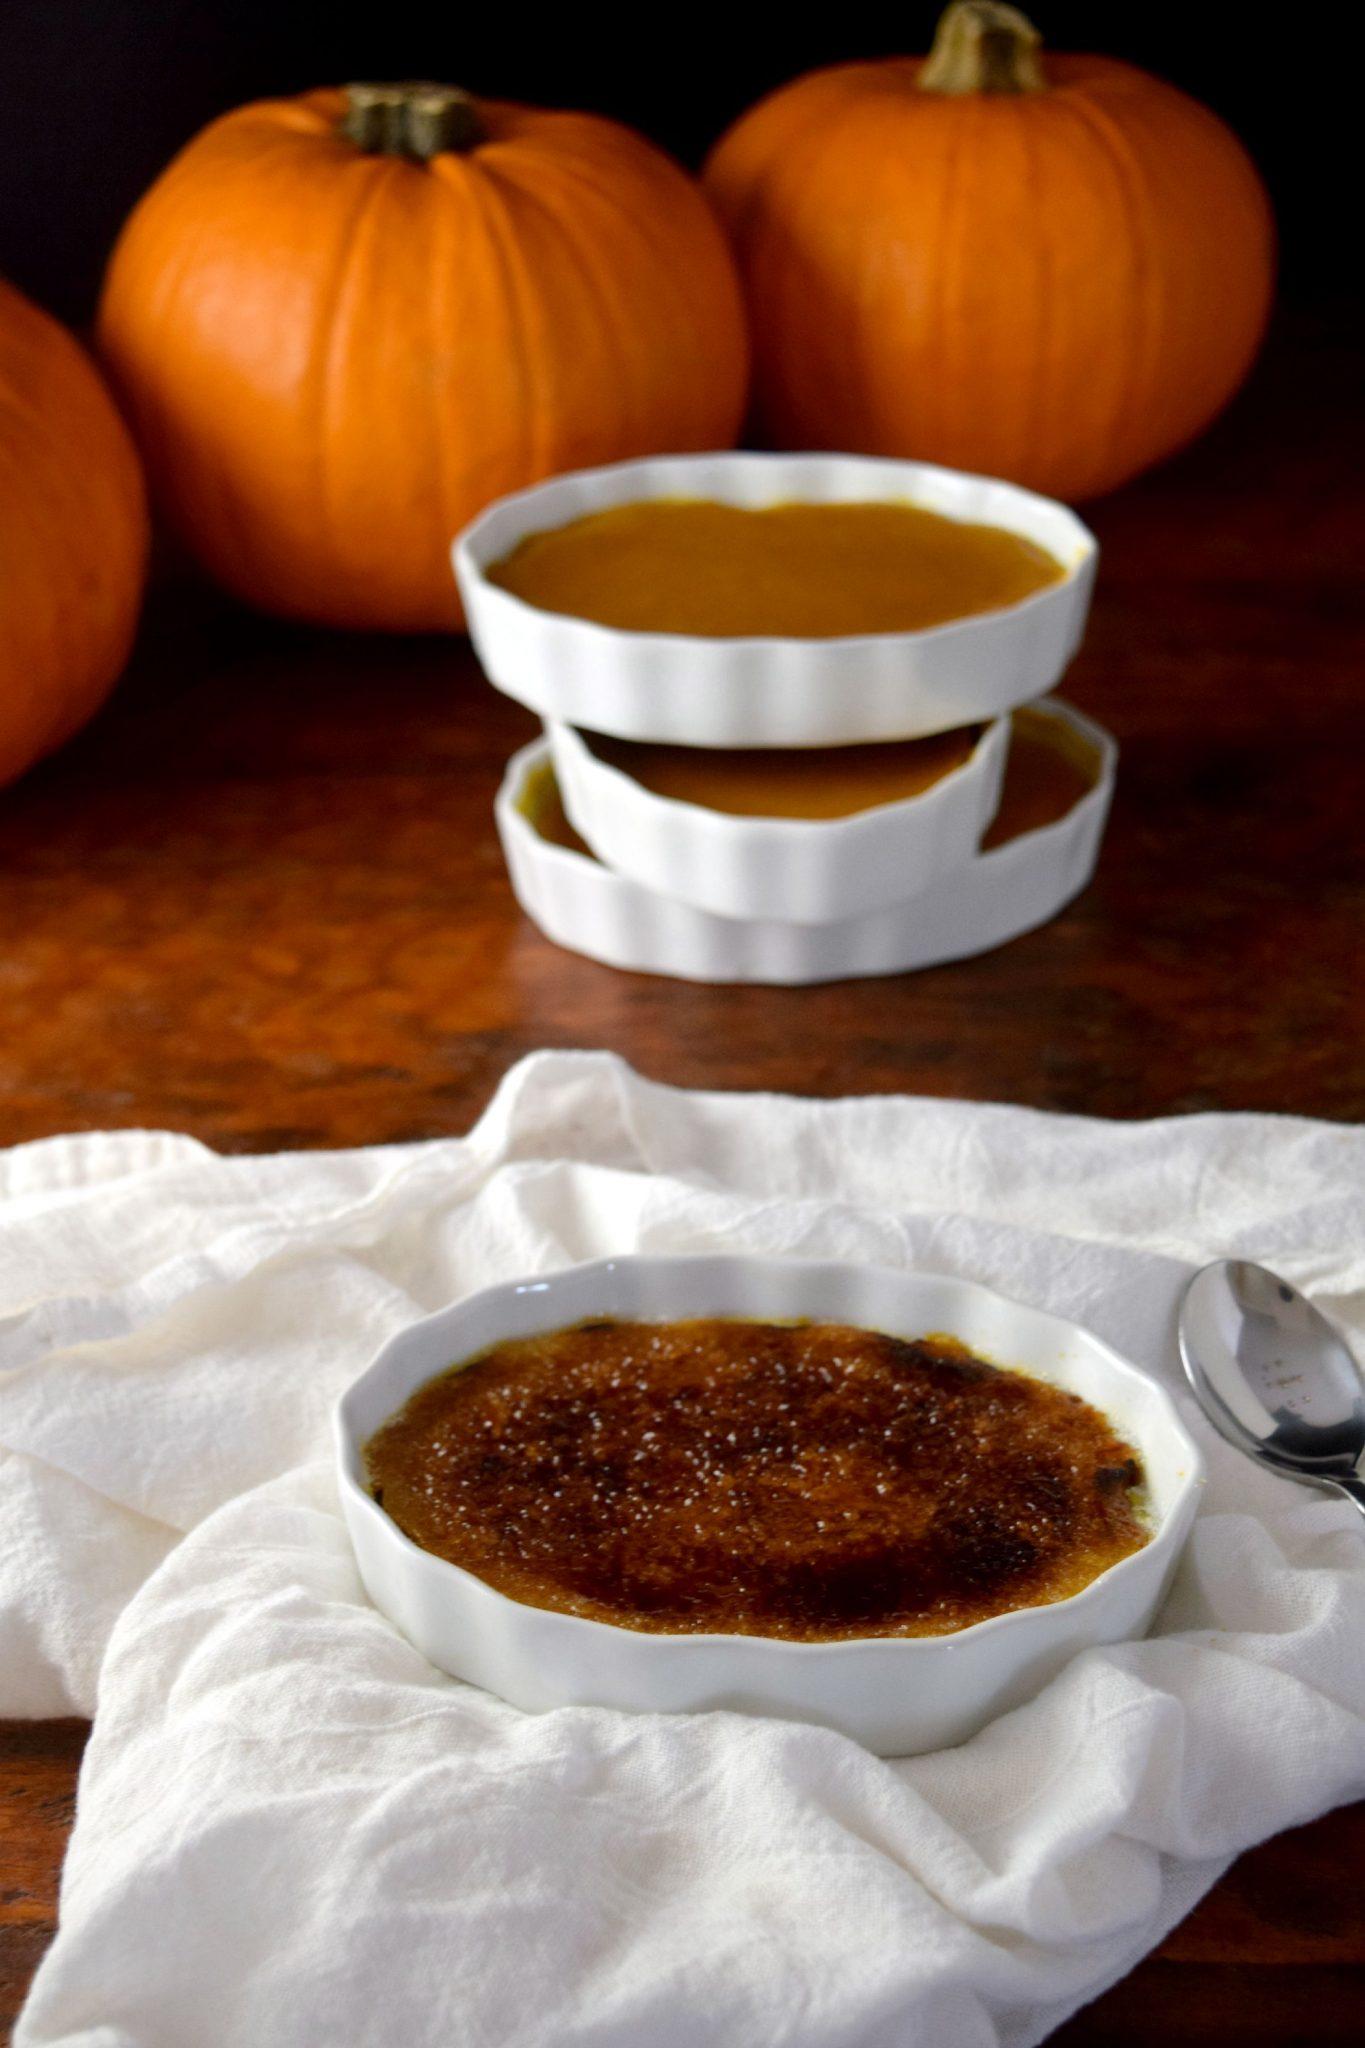 Communication on this topic: Pumpkin Crème Caramel, pumpkin-cr-me-caramel/